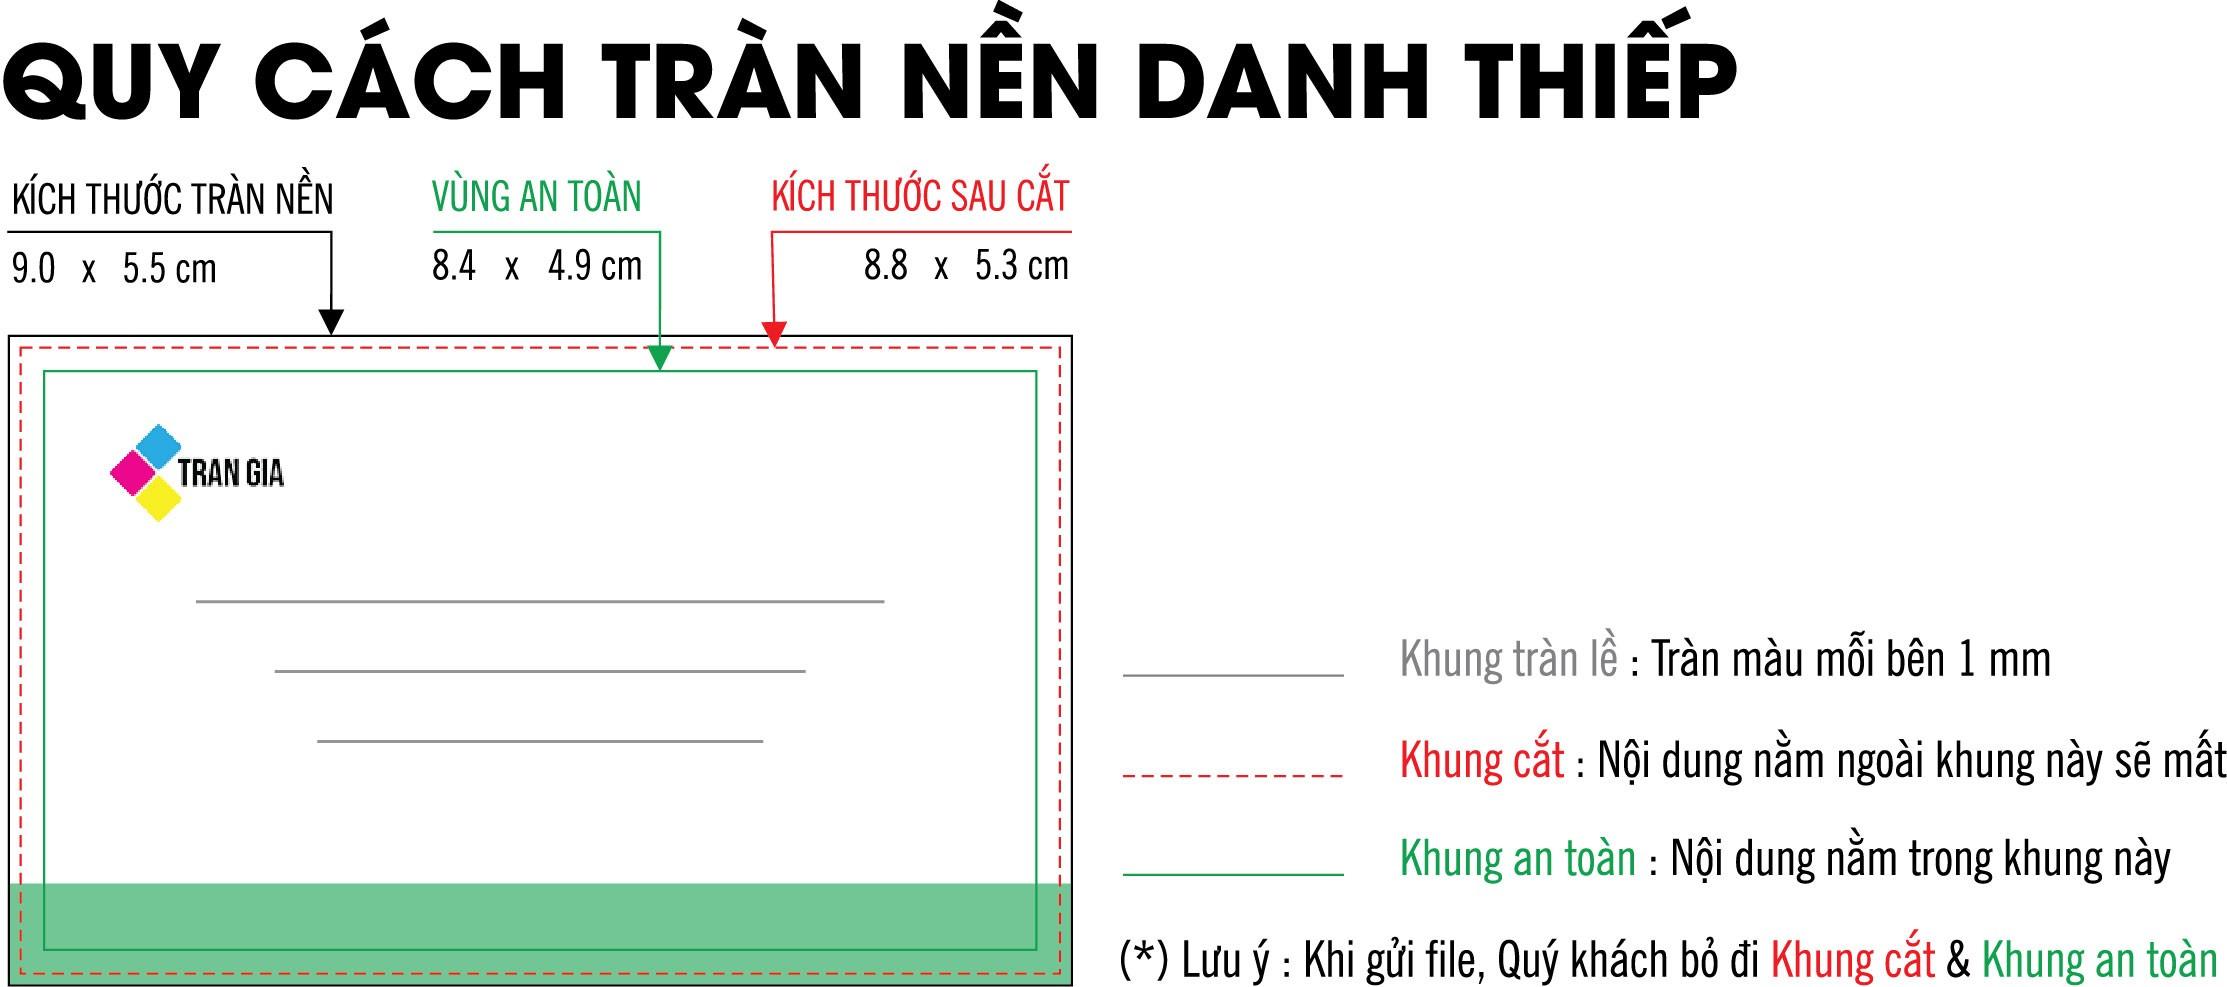 QUY CACH TRAN NEN DANH THIEP-01